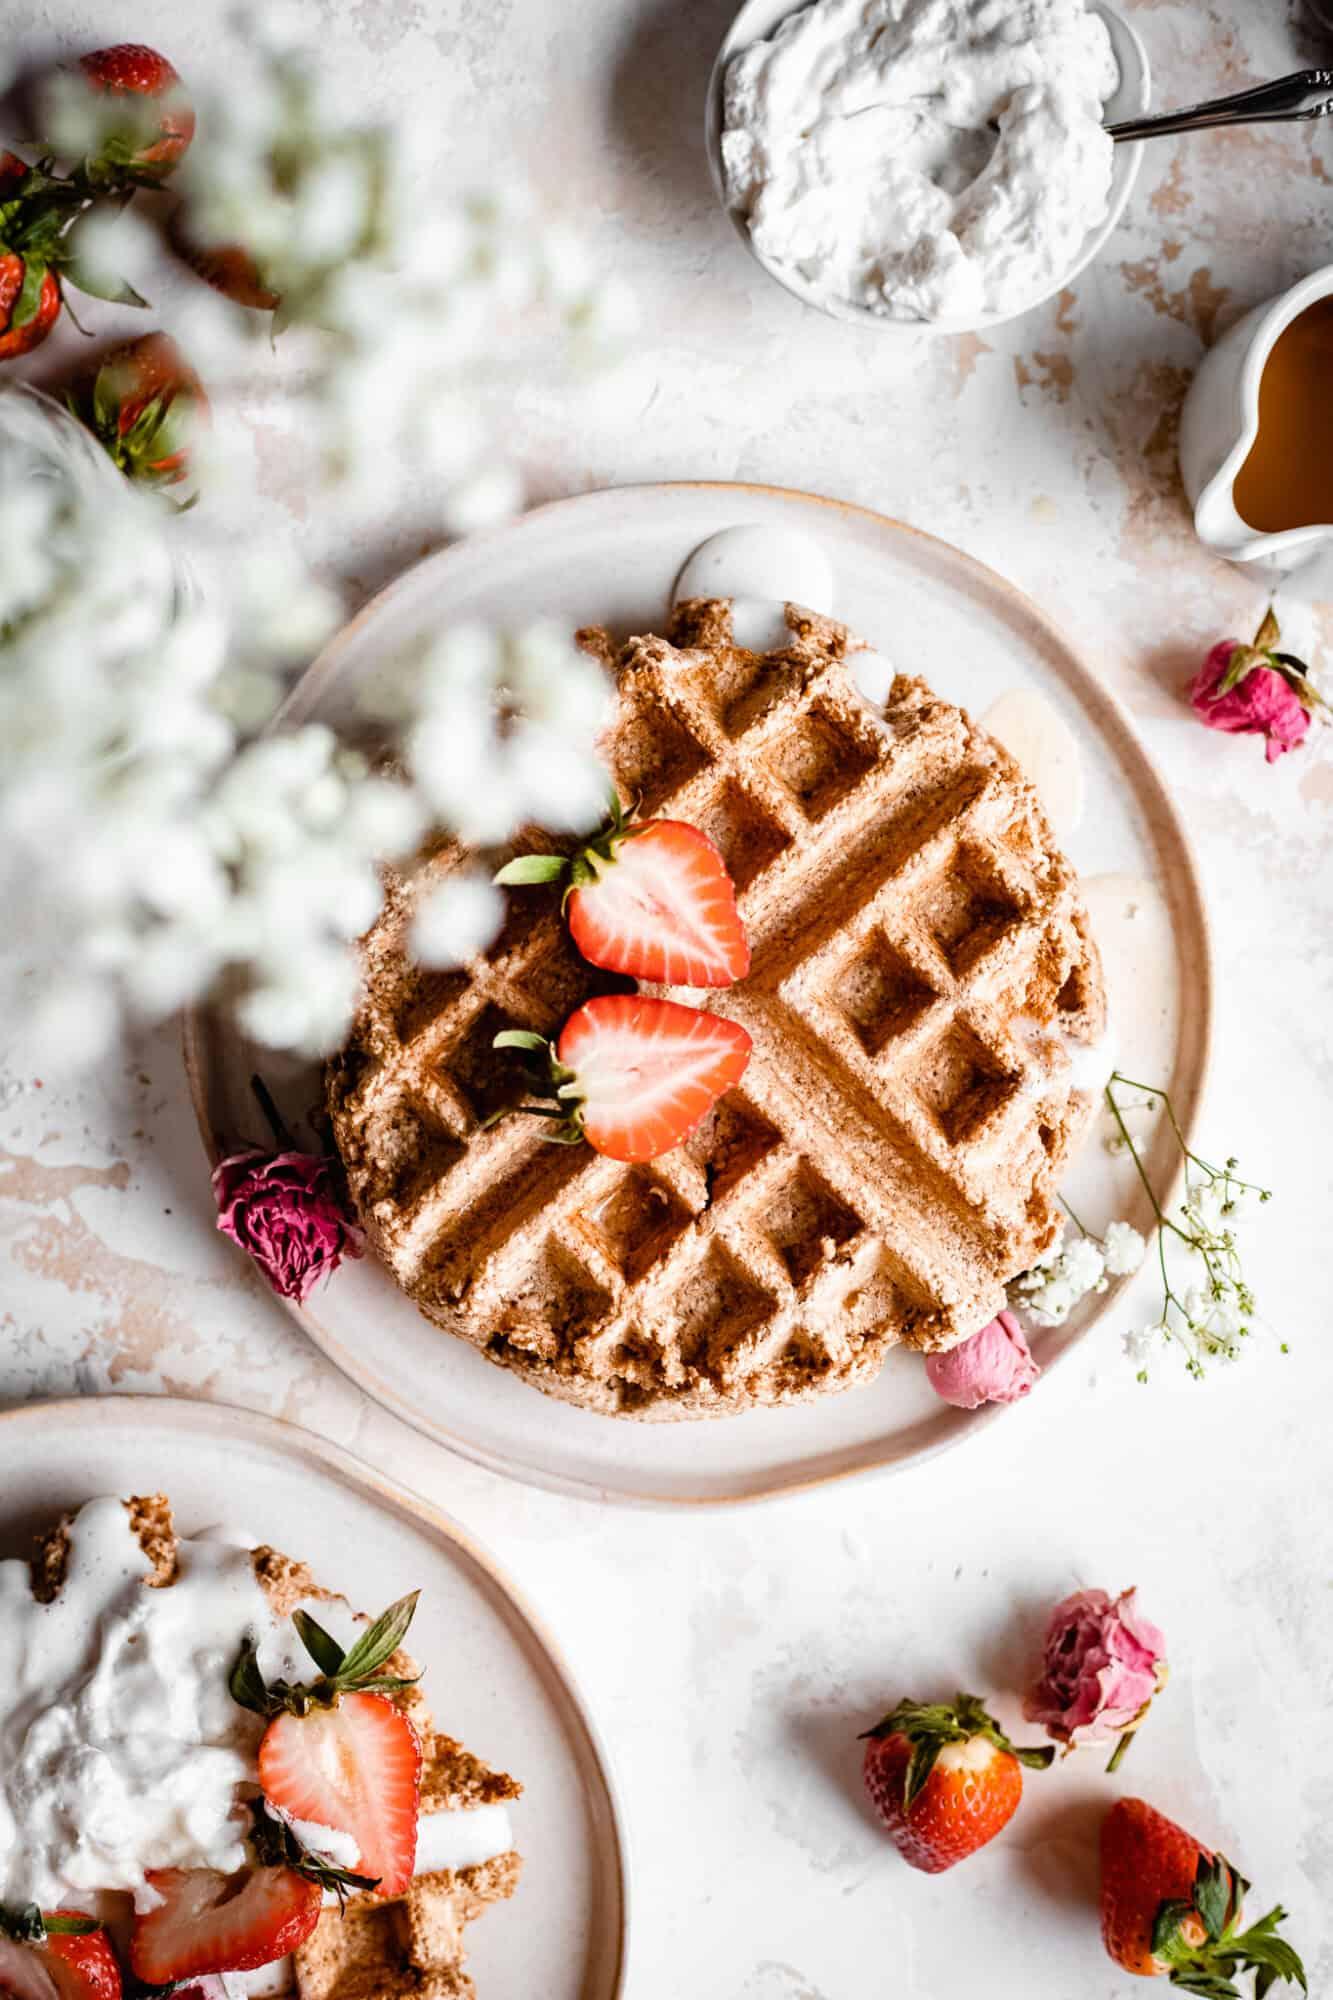 plates of oat flour waffles